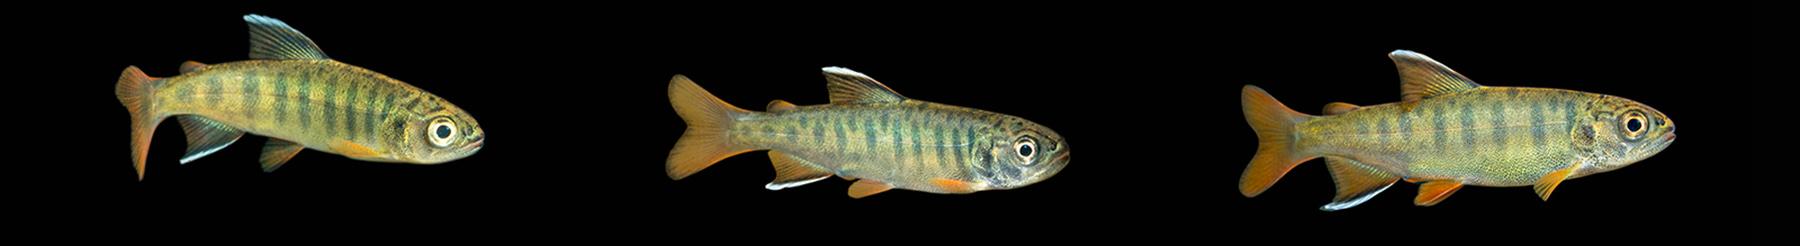 Underwater salmon video stock clips